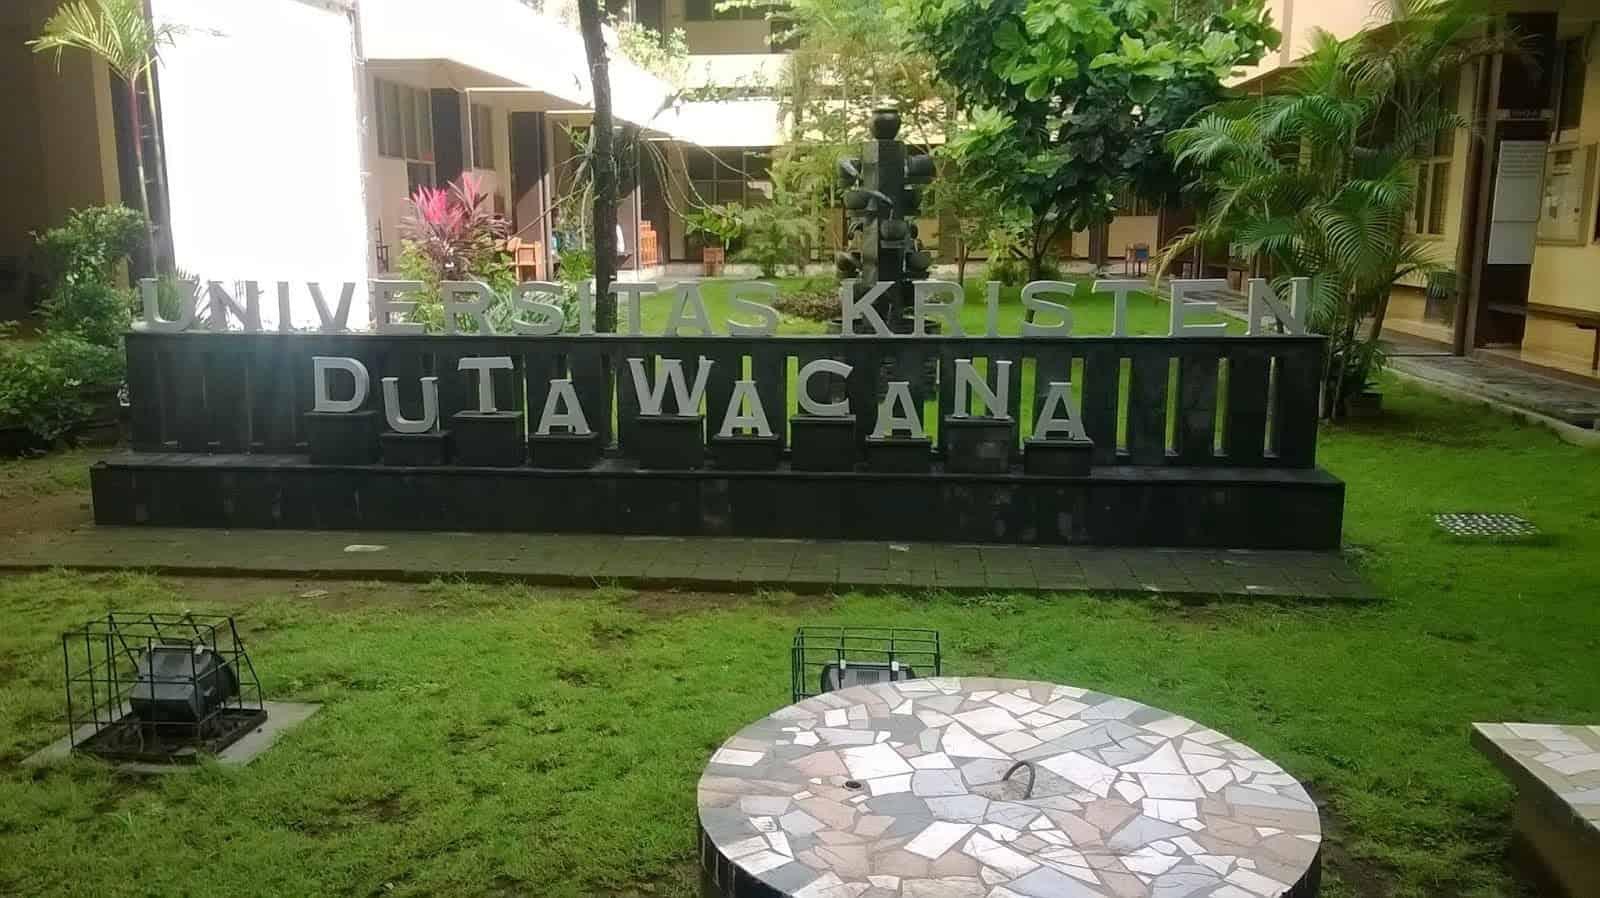 Universitas Kristen Duta Wacana (UKDW)